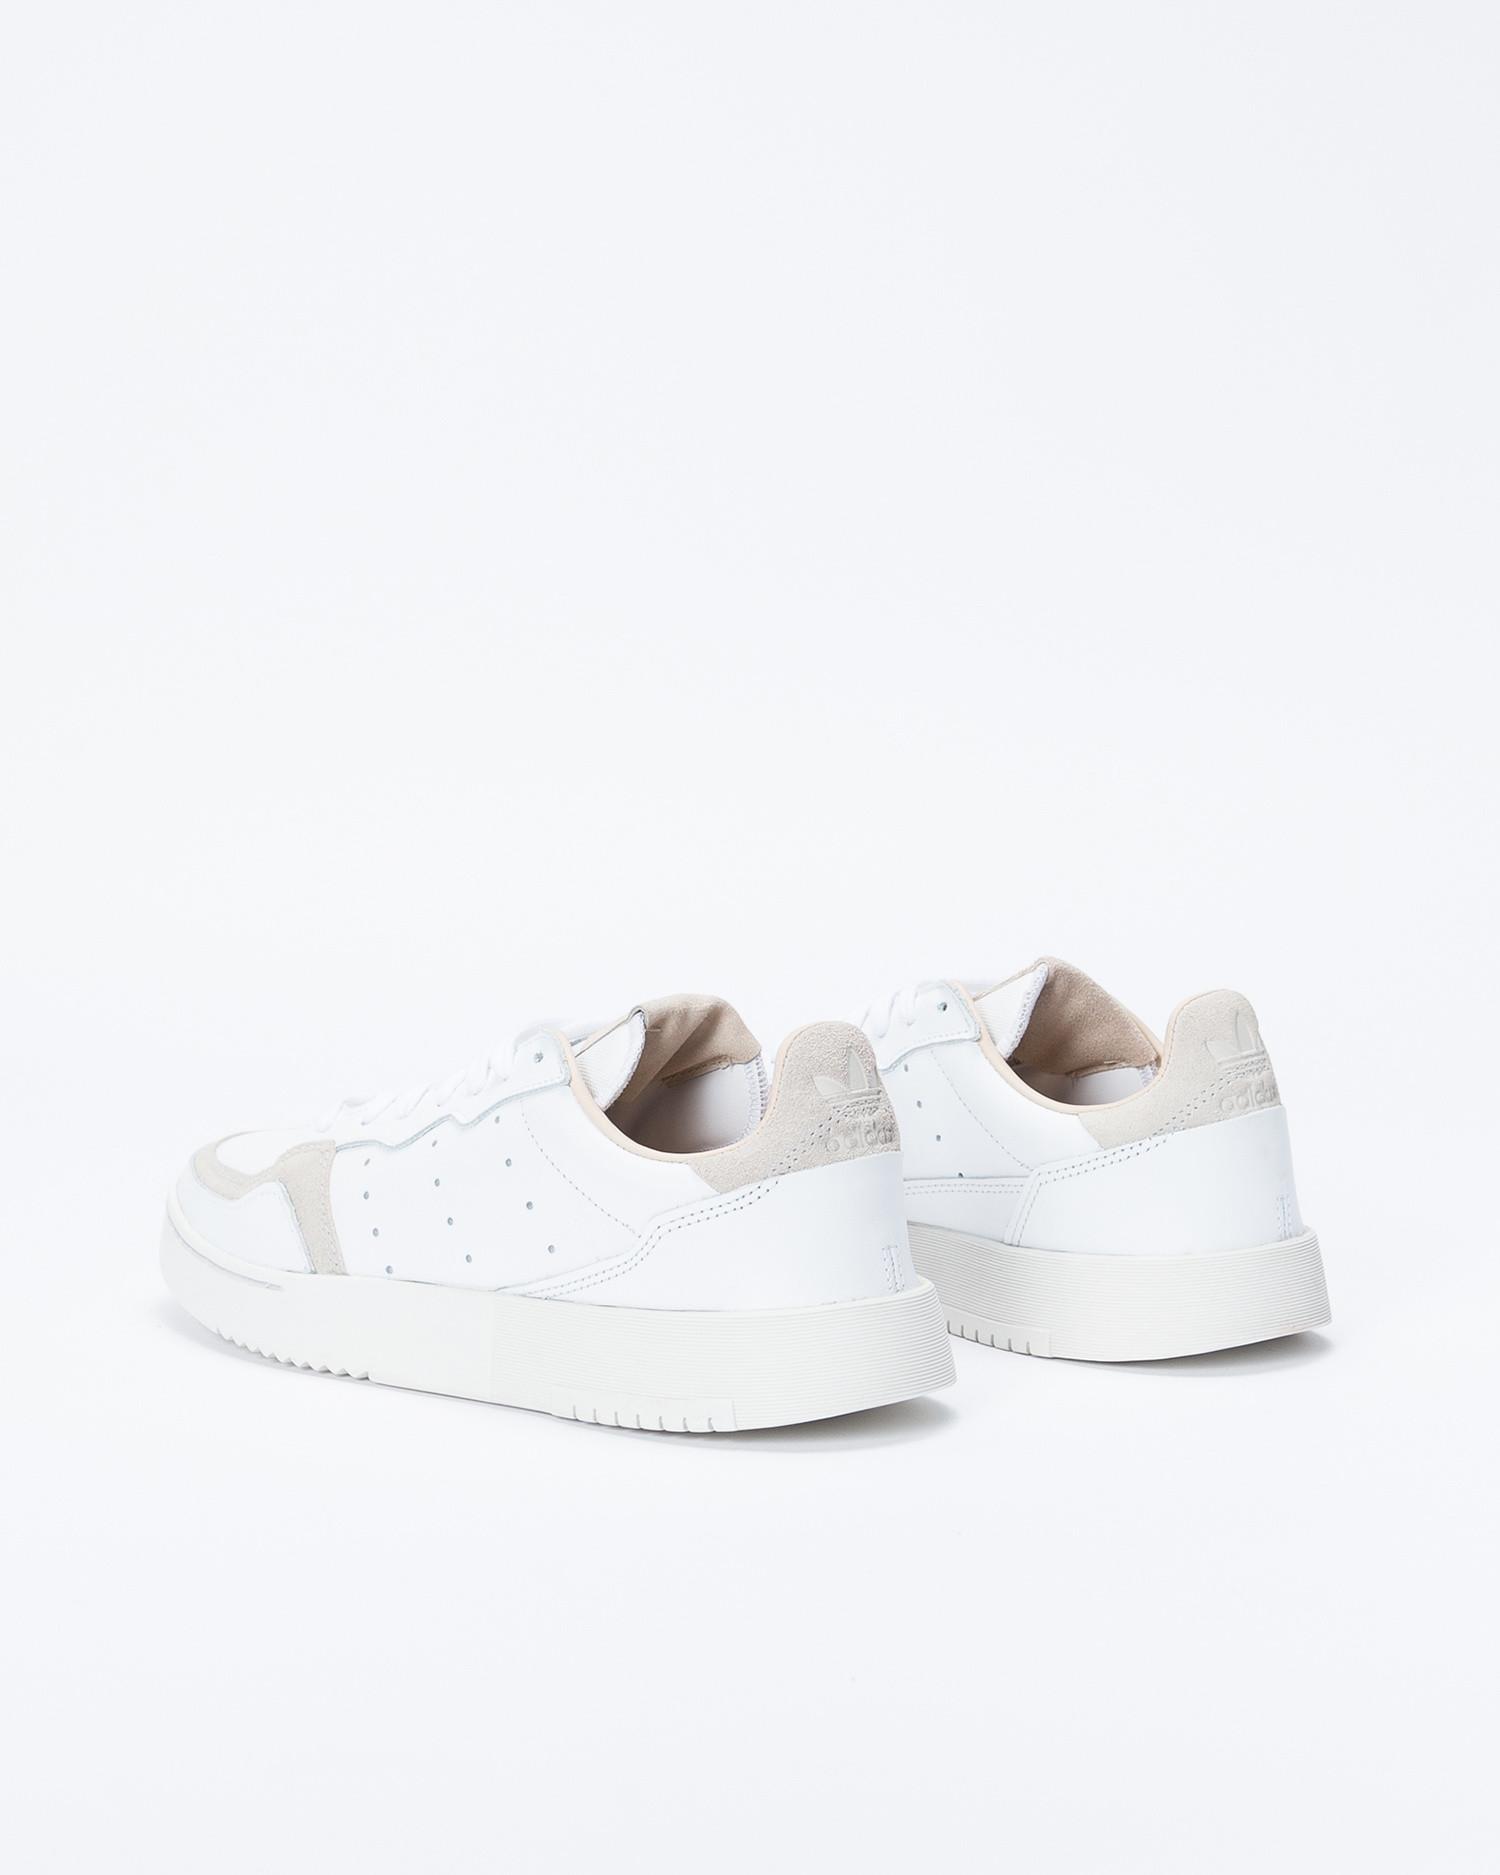 Adidas Supercourt footwear white